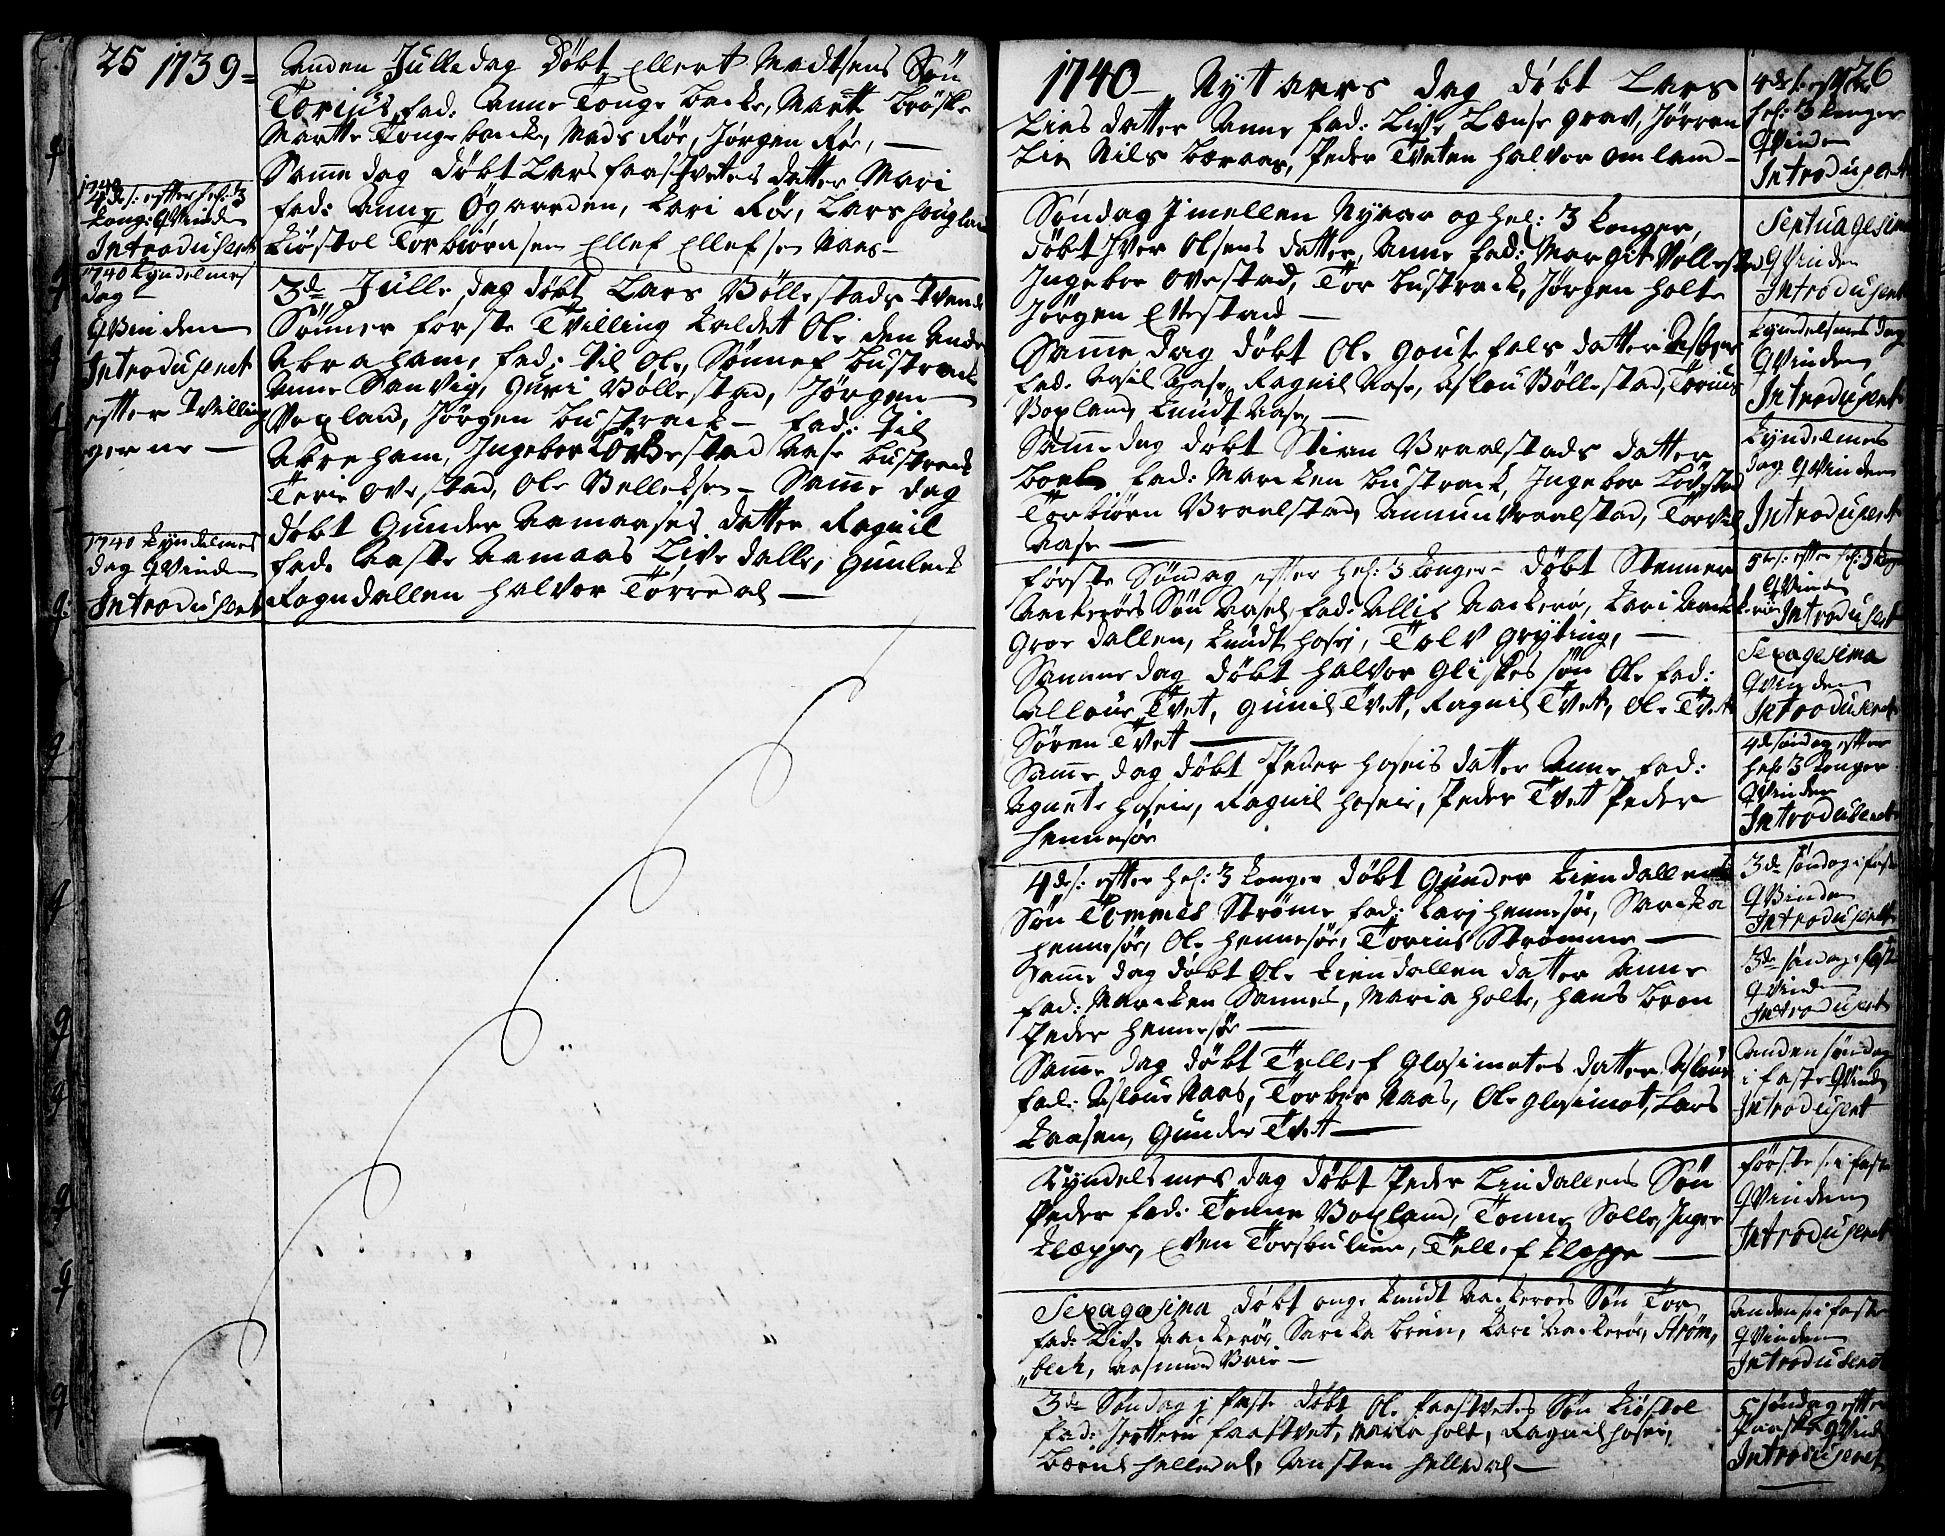 SAKO, Drangedal kirkebøker, F/Fa/L0002: Ministerialbok nr. 2, 1733-1753, s. 25-26